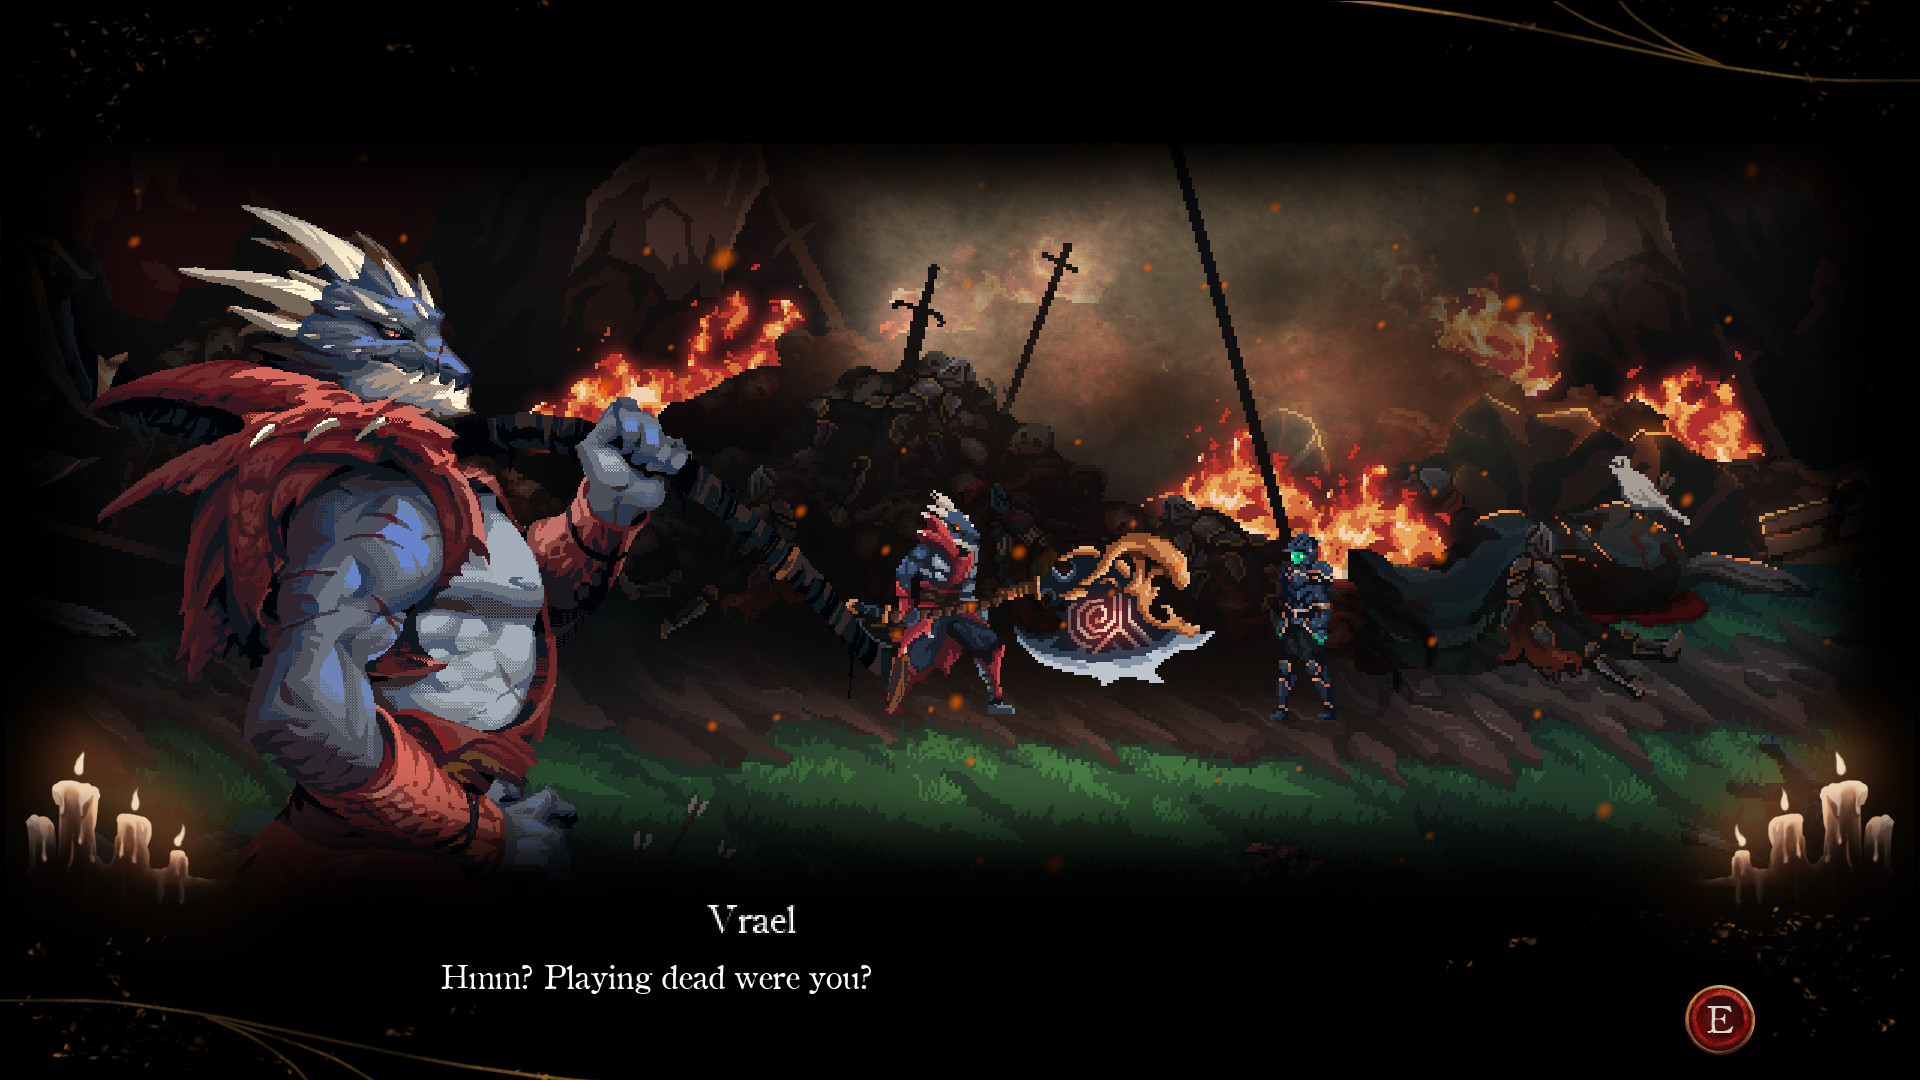 deaths-gambit-afterlife-pc-screenshot-3